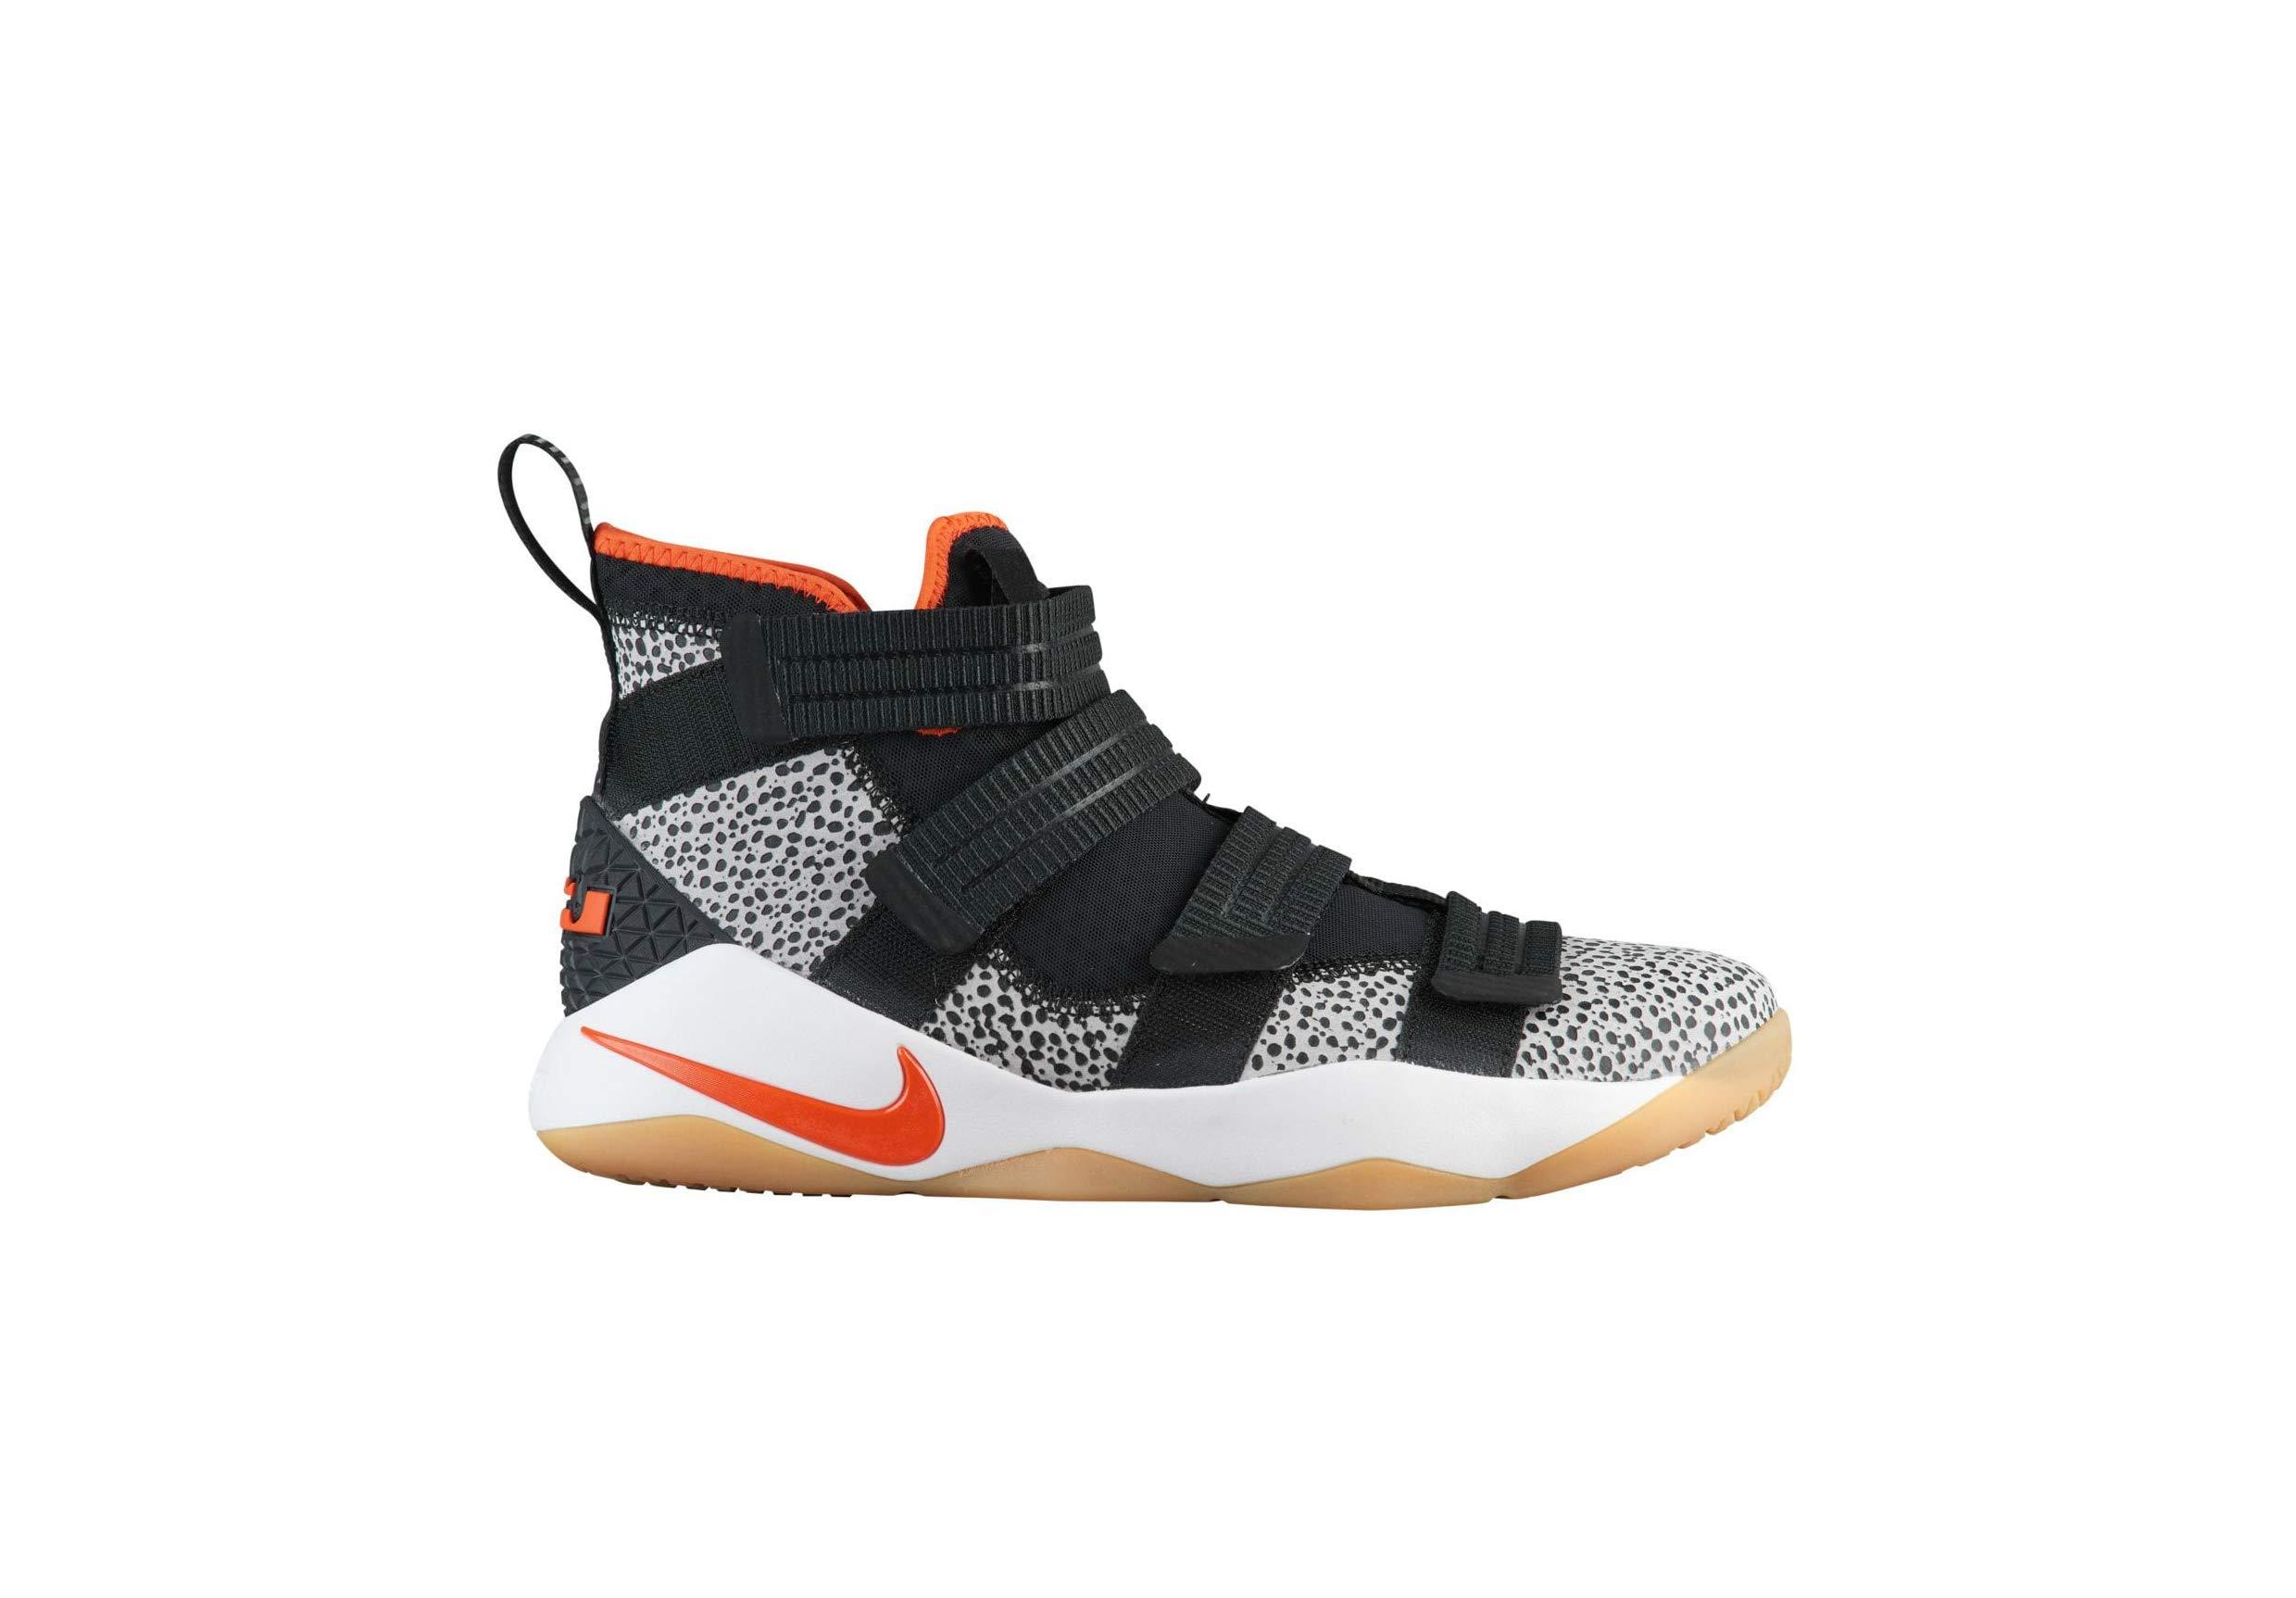 huge discount afff9 3f7ba Galleon - NIKE Lebron Soldier XI SFG Mens Basketball-Shoes 897646-006 12 -  Safari